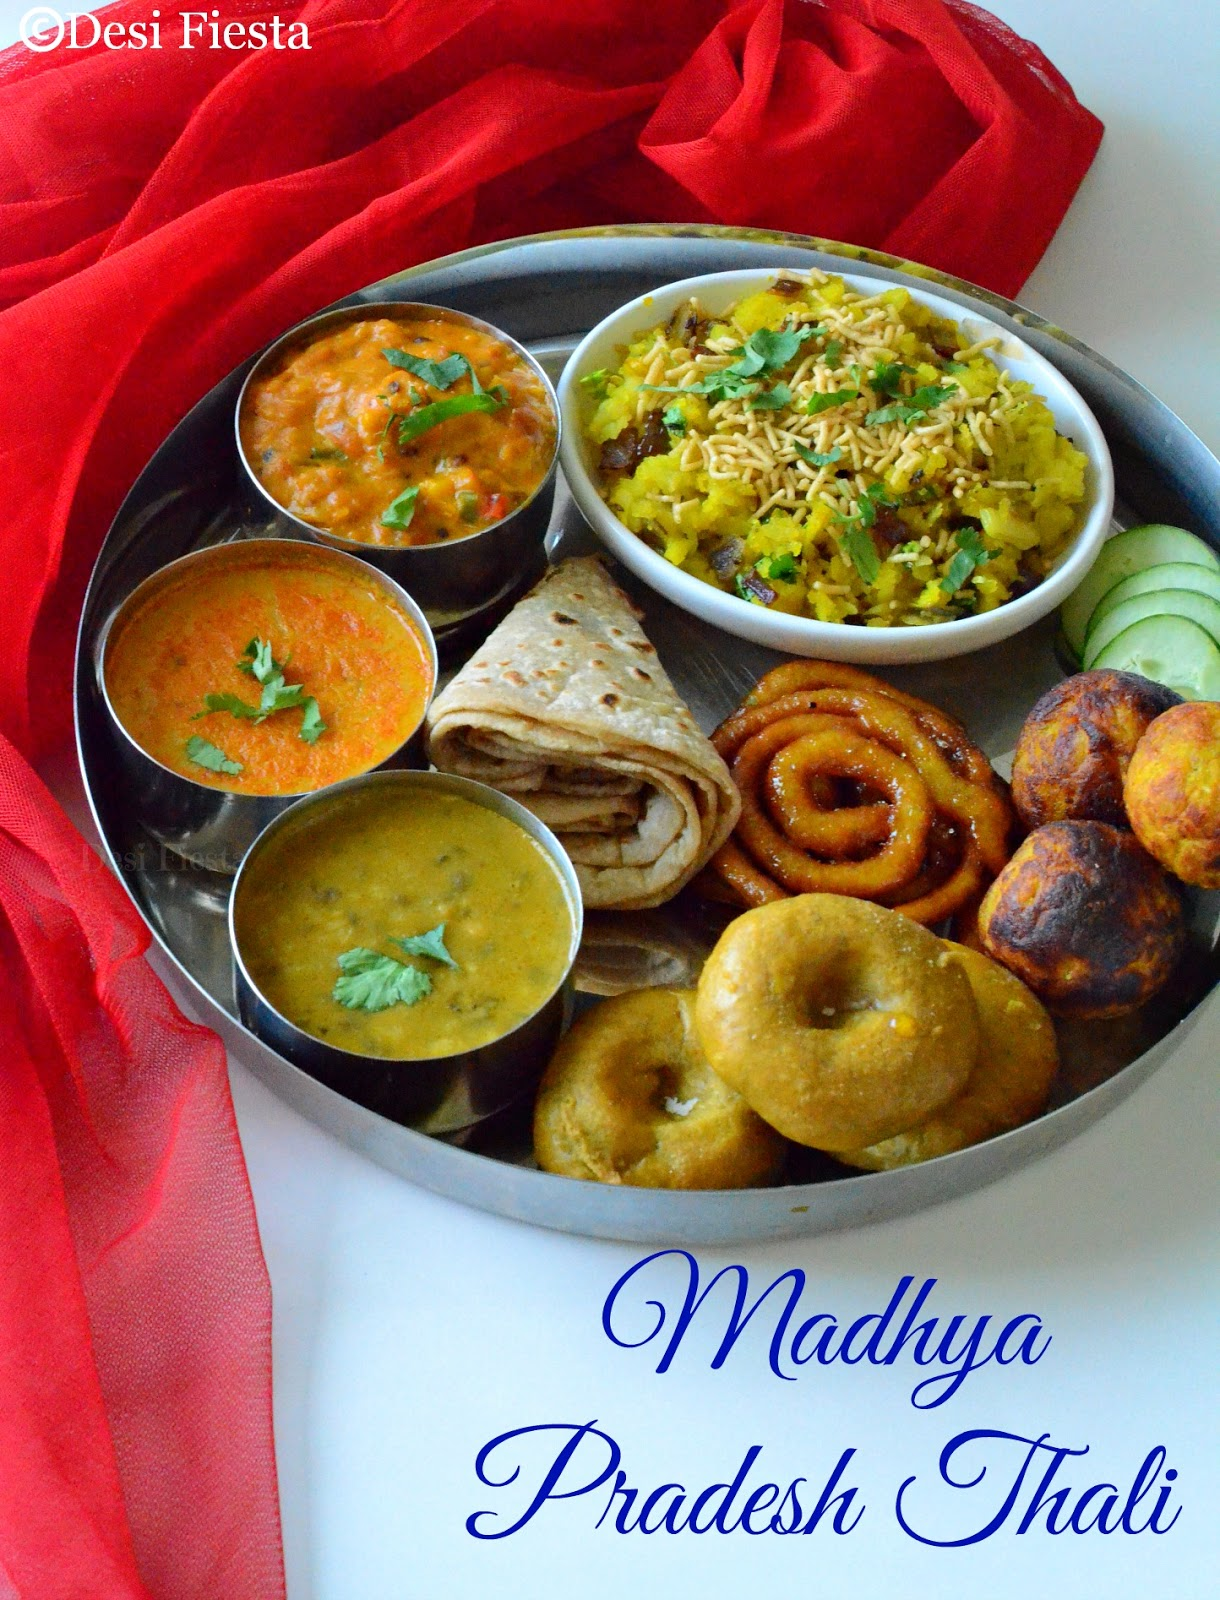 Desi fiesta madhya pradesh thali for Arunachal pradesh cuisine